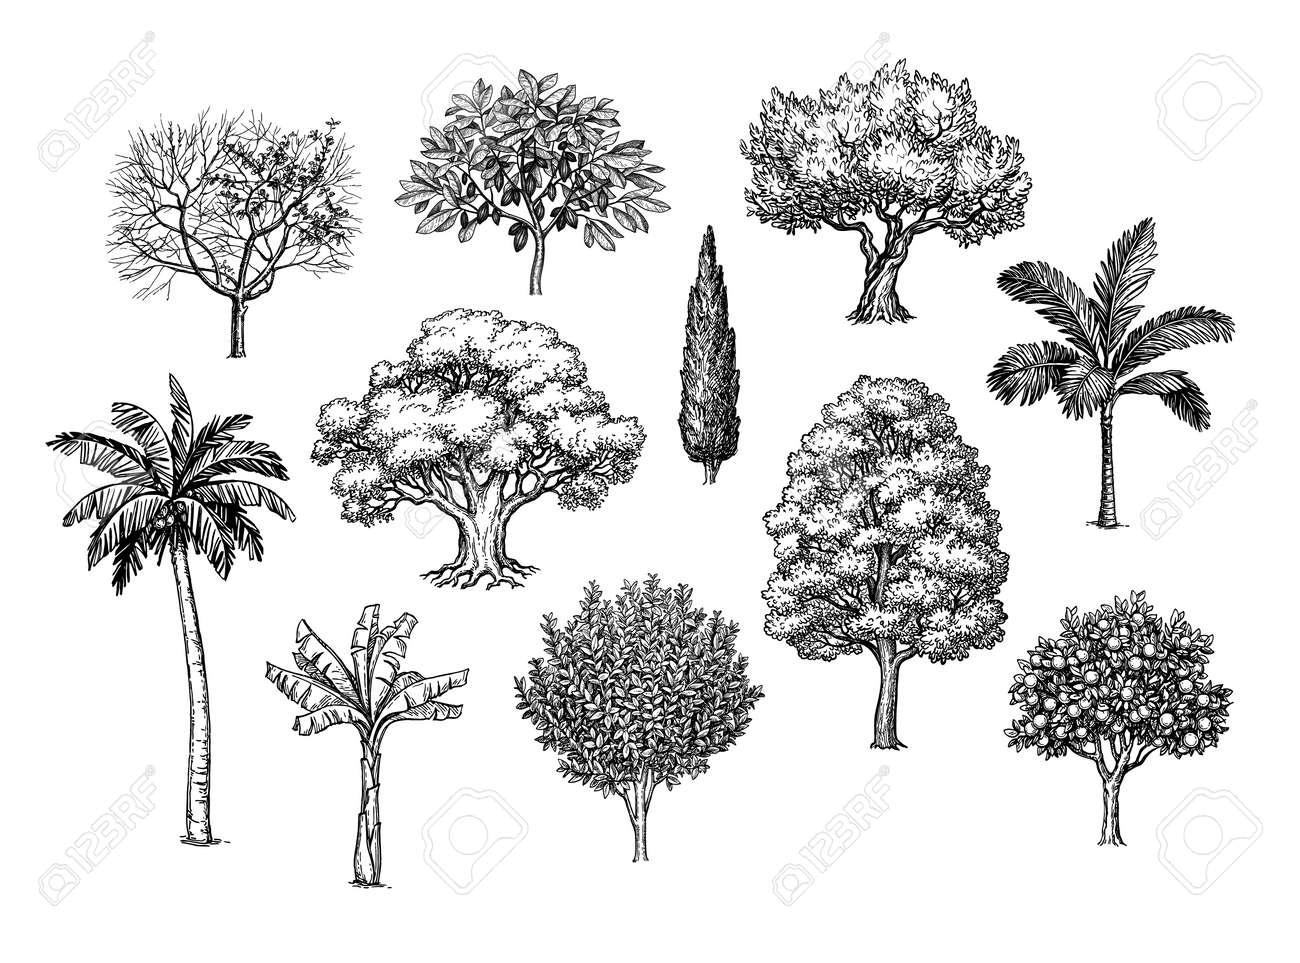 Ink sketch of trees. - 131416277